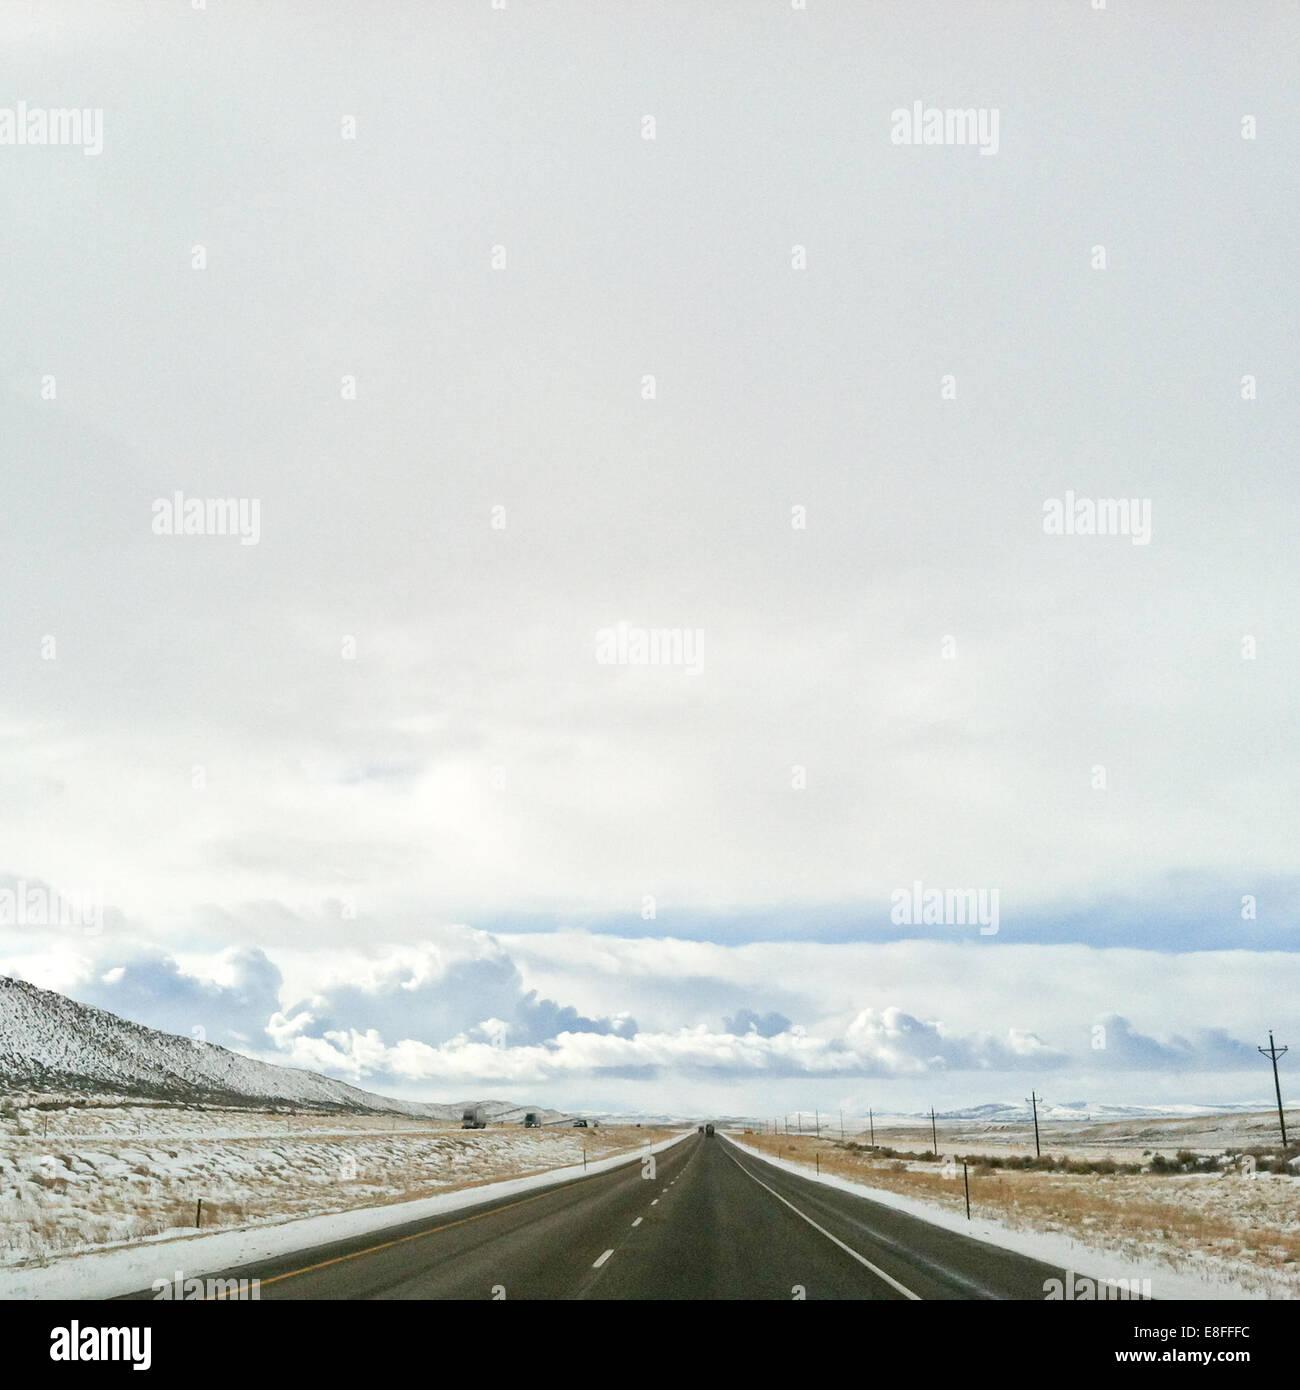 Carretera recta vacía, América, EE.UU. Imagen De Stock